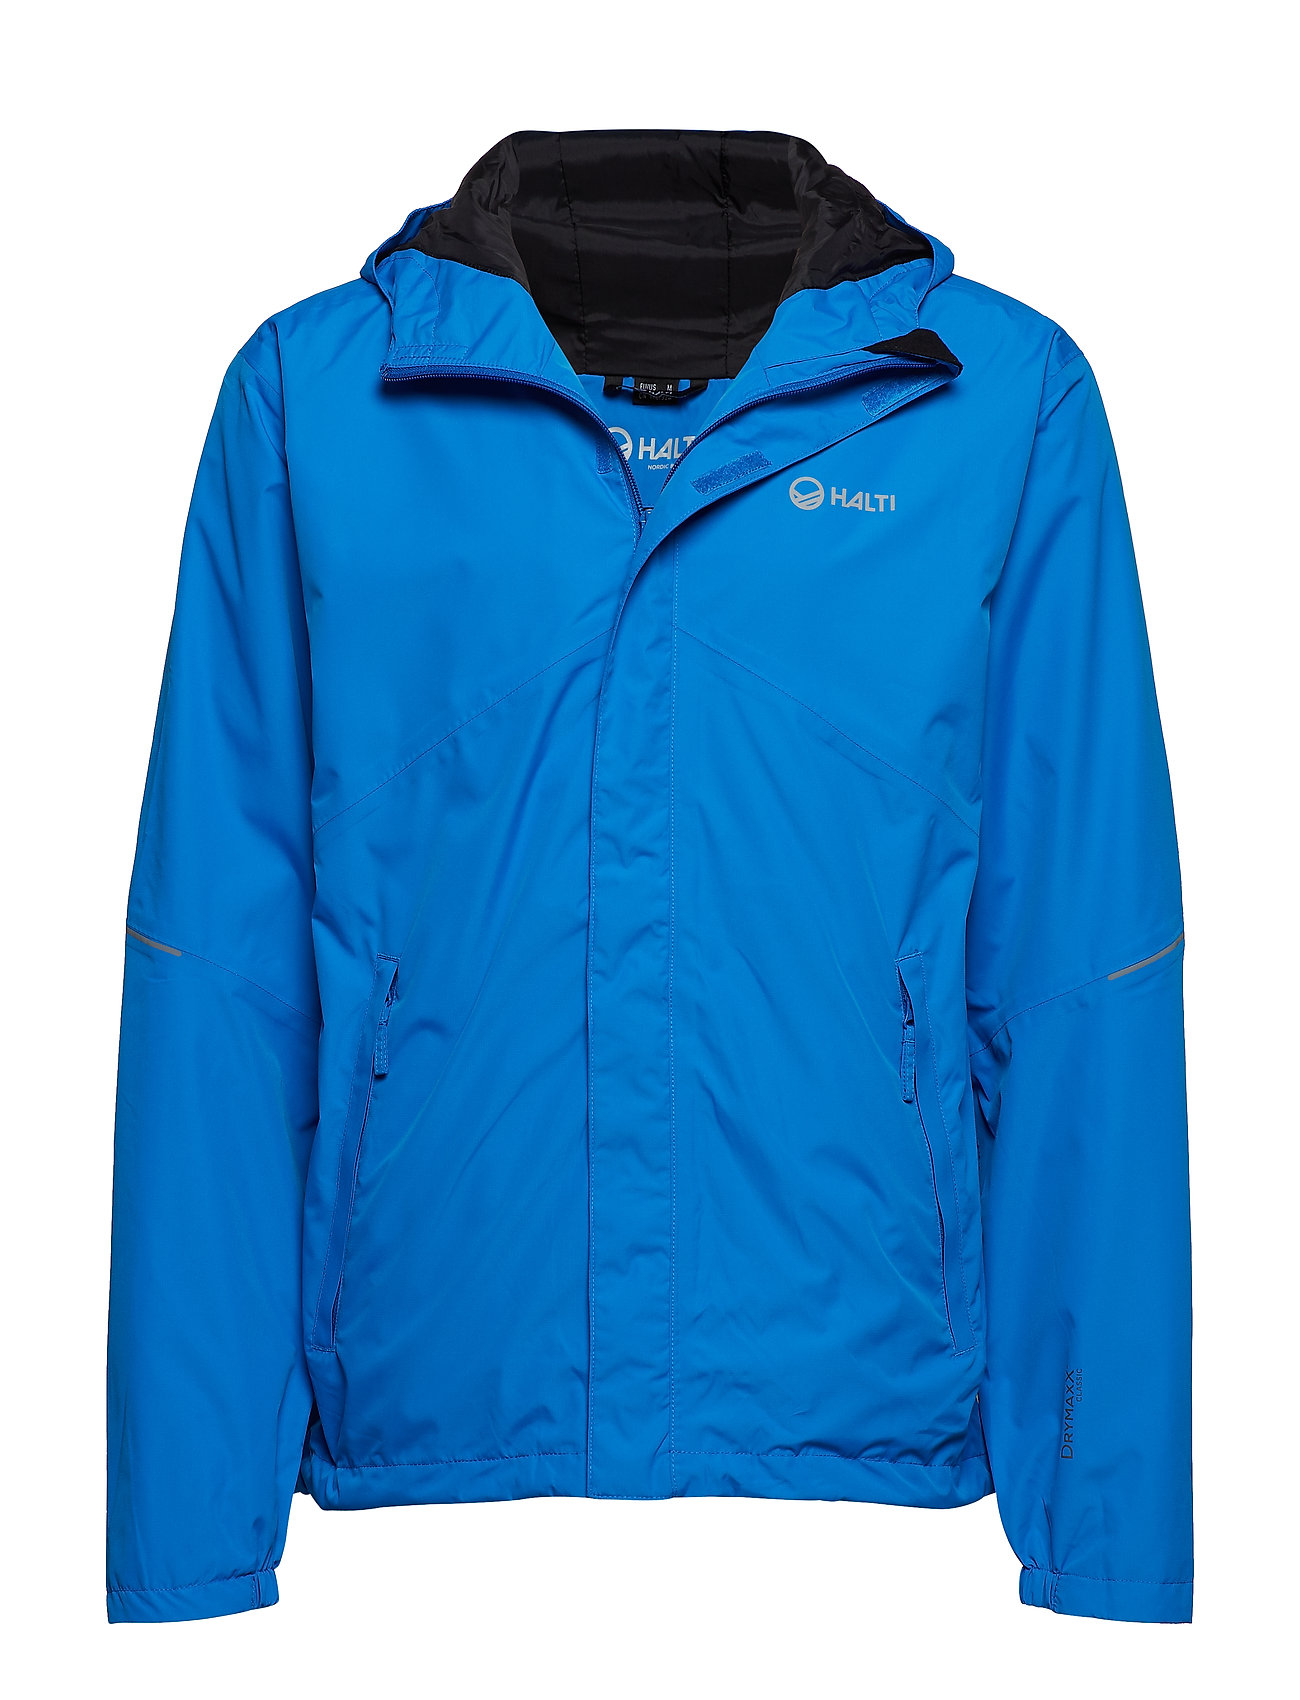 Halti Caima M DX Shell Jacket - SKYDIVER BLUE